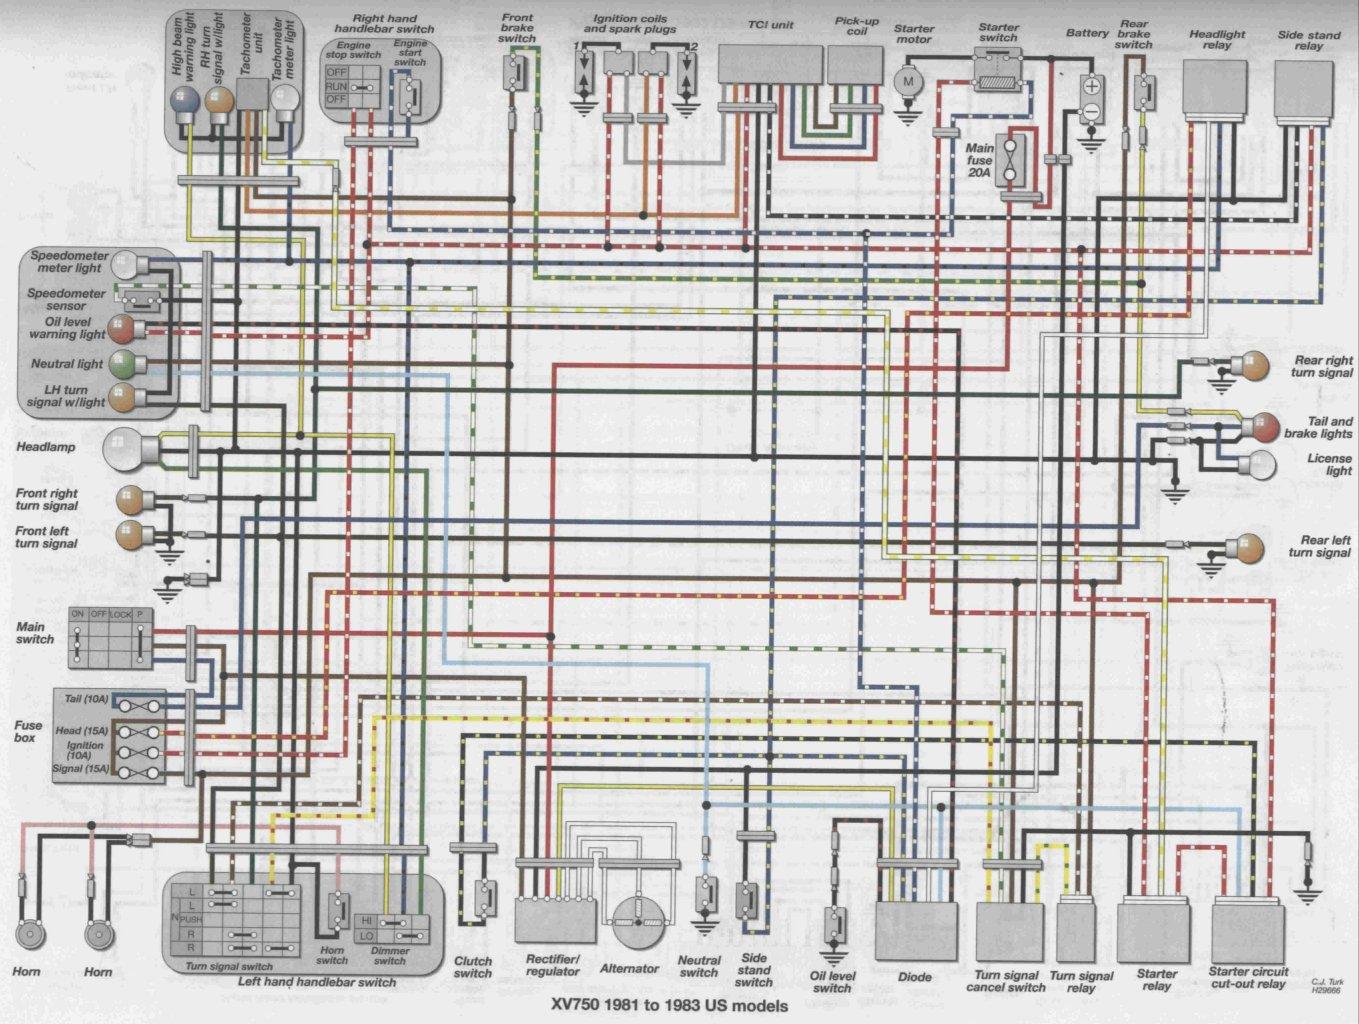 xv750 wiring diagram machine repair manual  wiring diagram 1983 yamaha midnight maxim #4